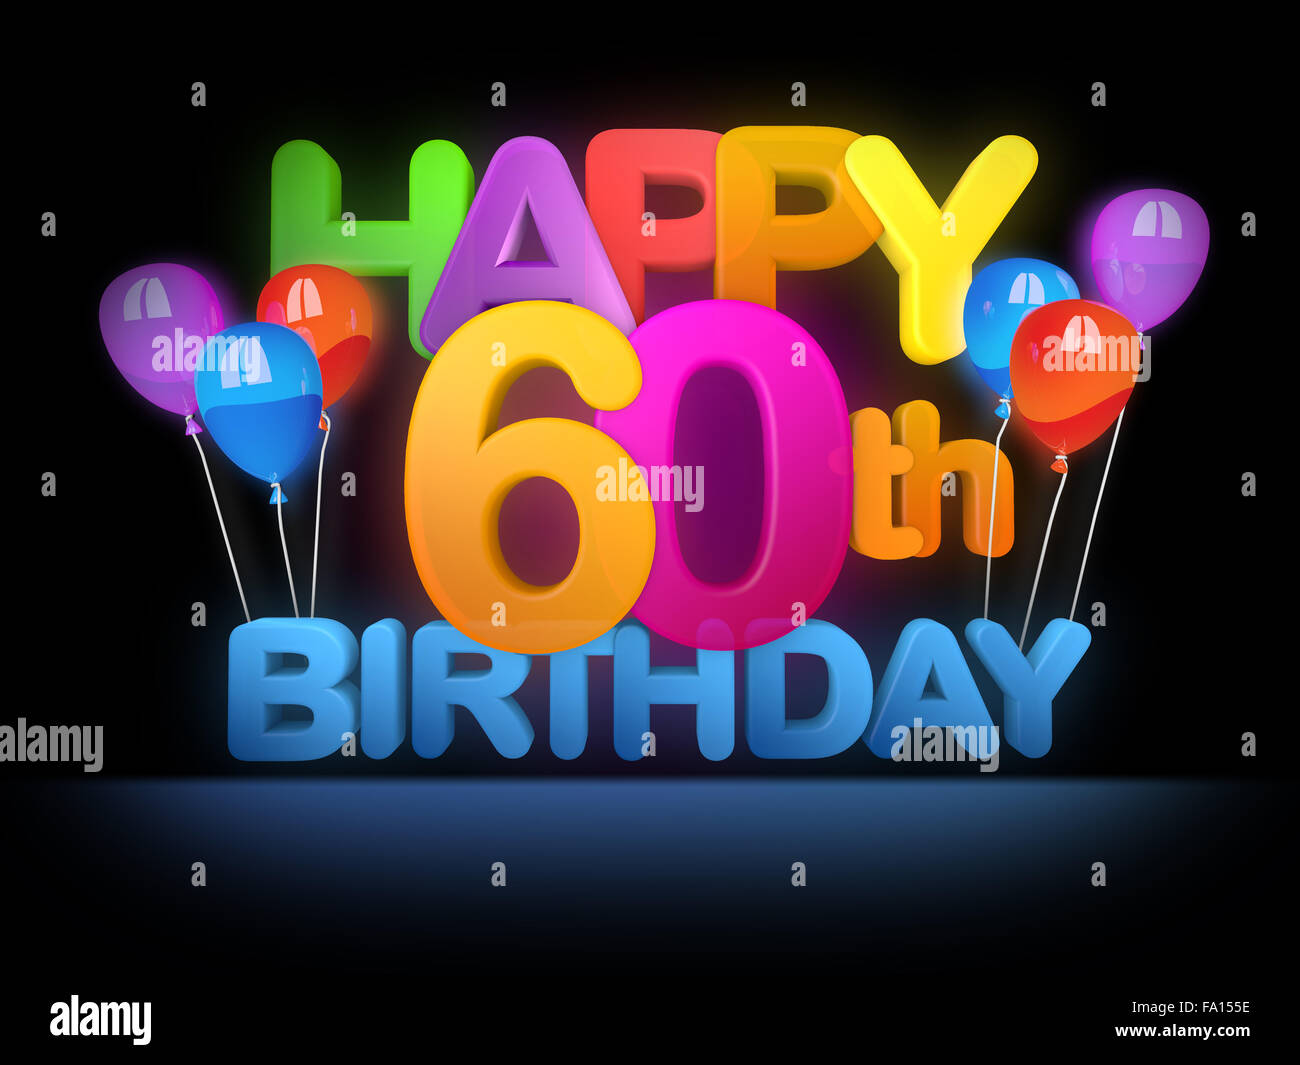 Happy 60th Birthday Stock Photos Amp Happy 60th Birthday